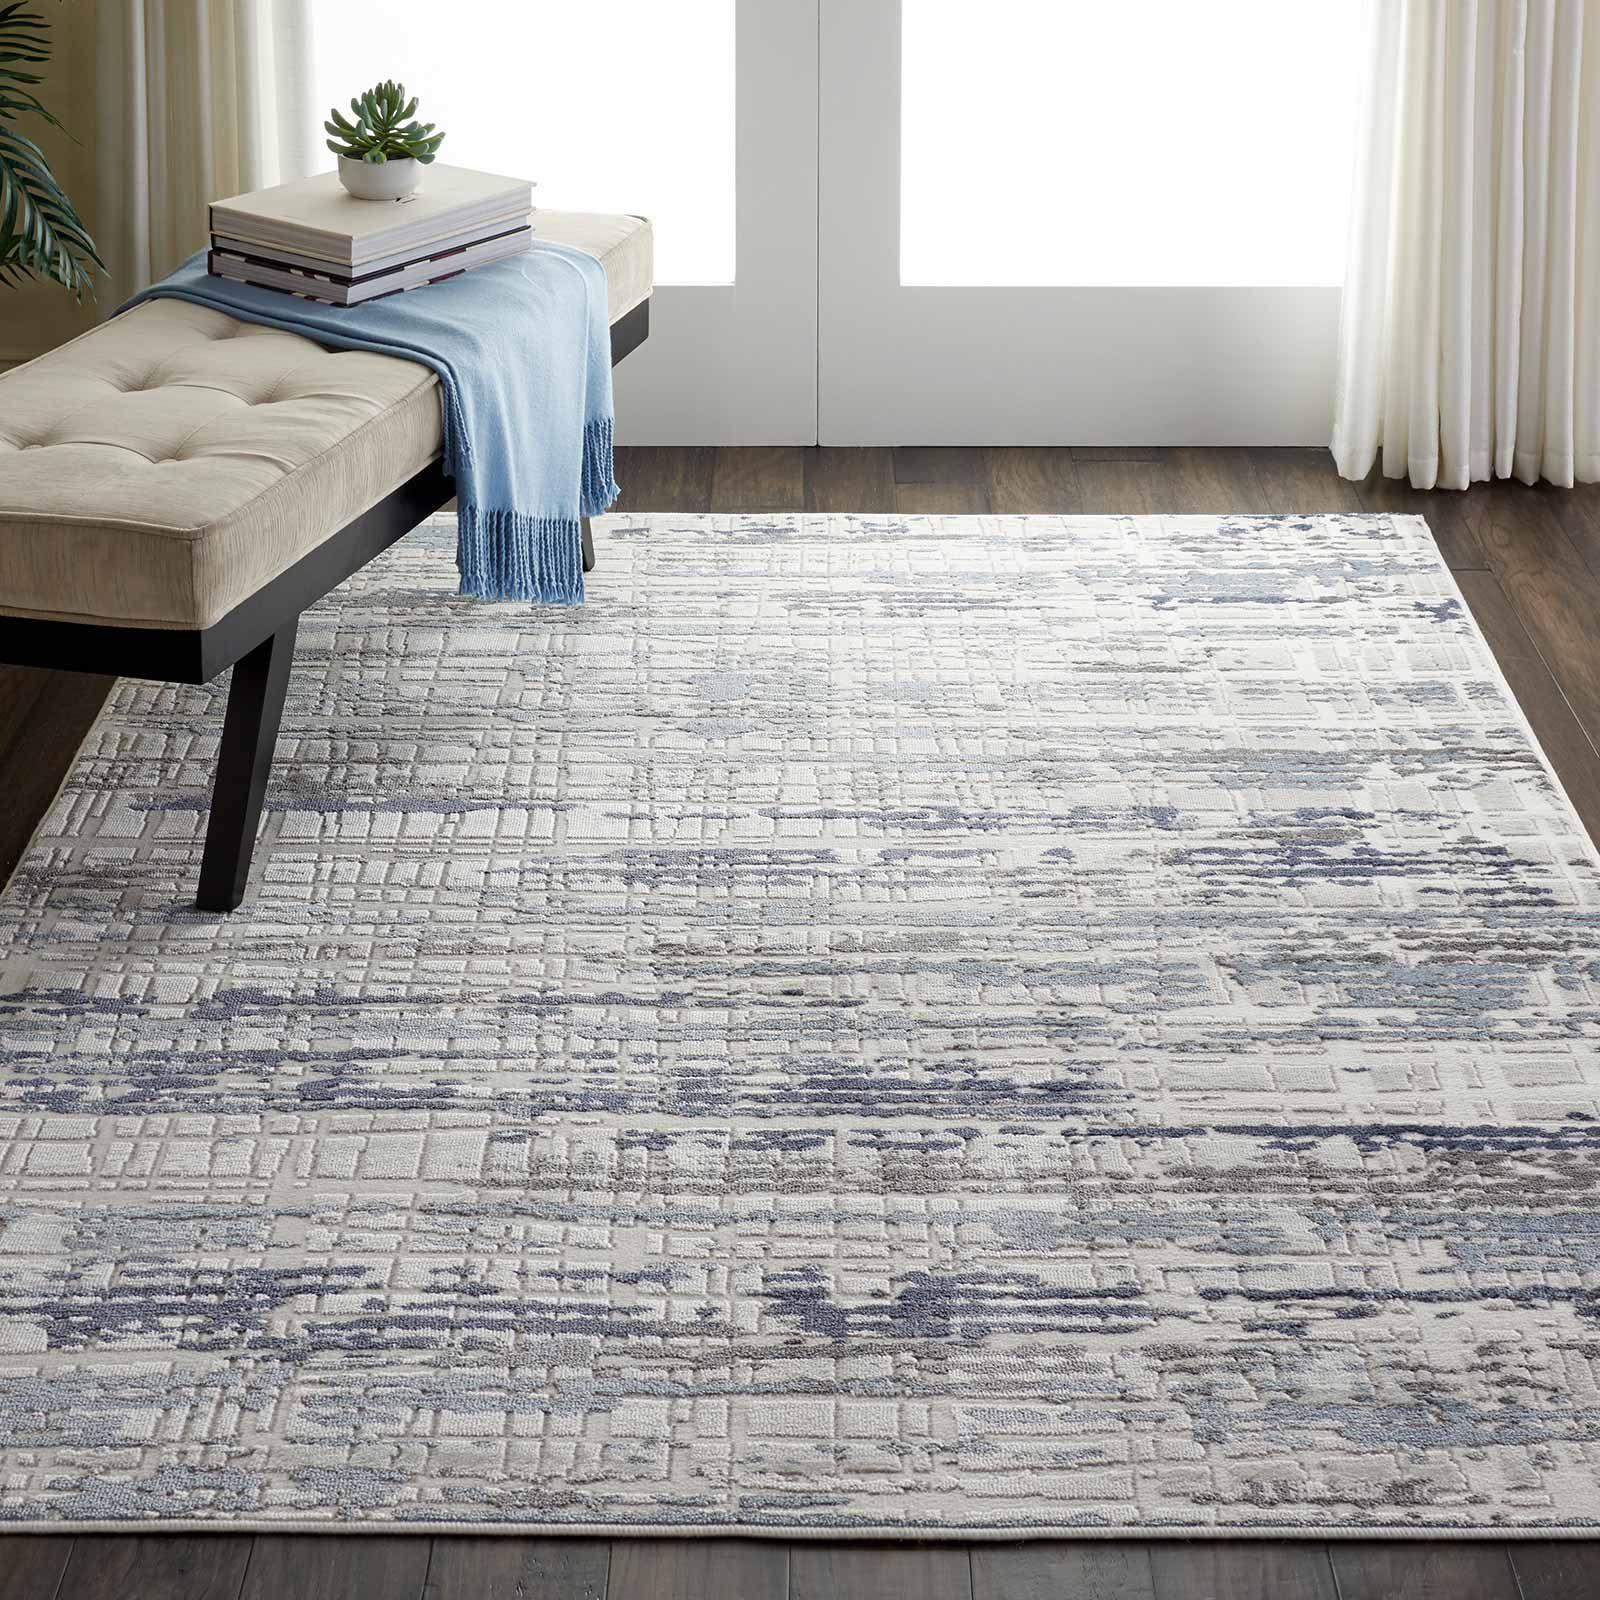 Nourison rug Urban Decor URD01 SLTIV 4x6 099446143556 interior 1 C